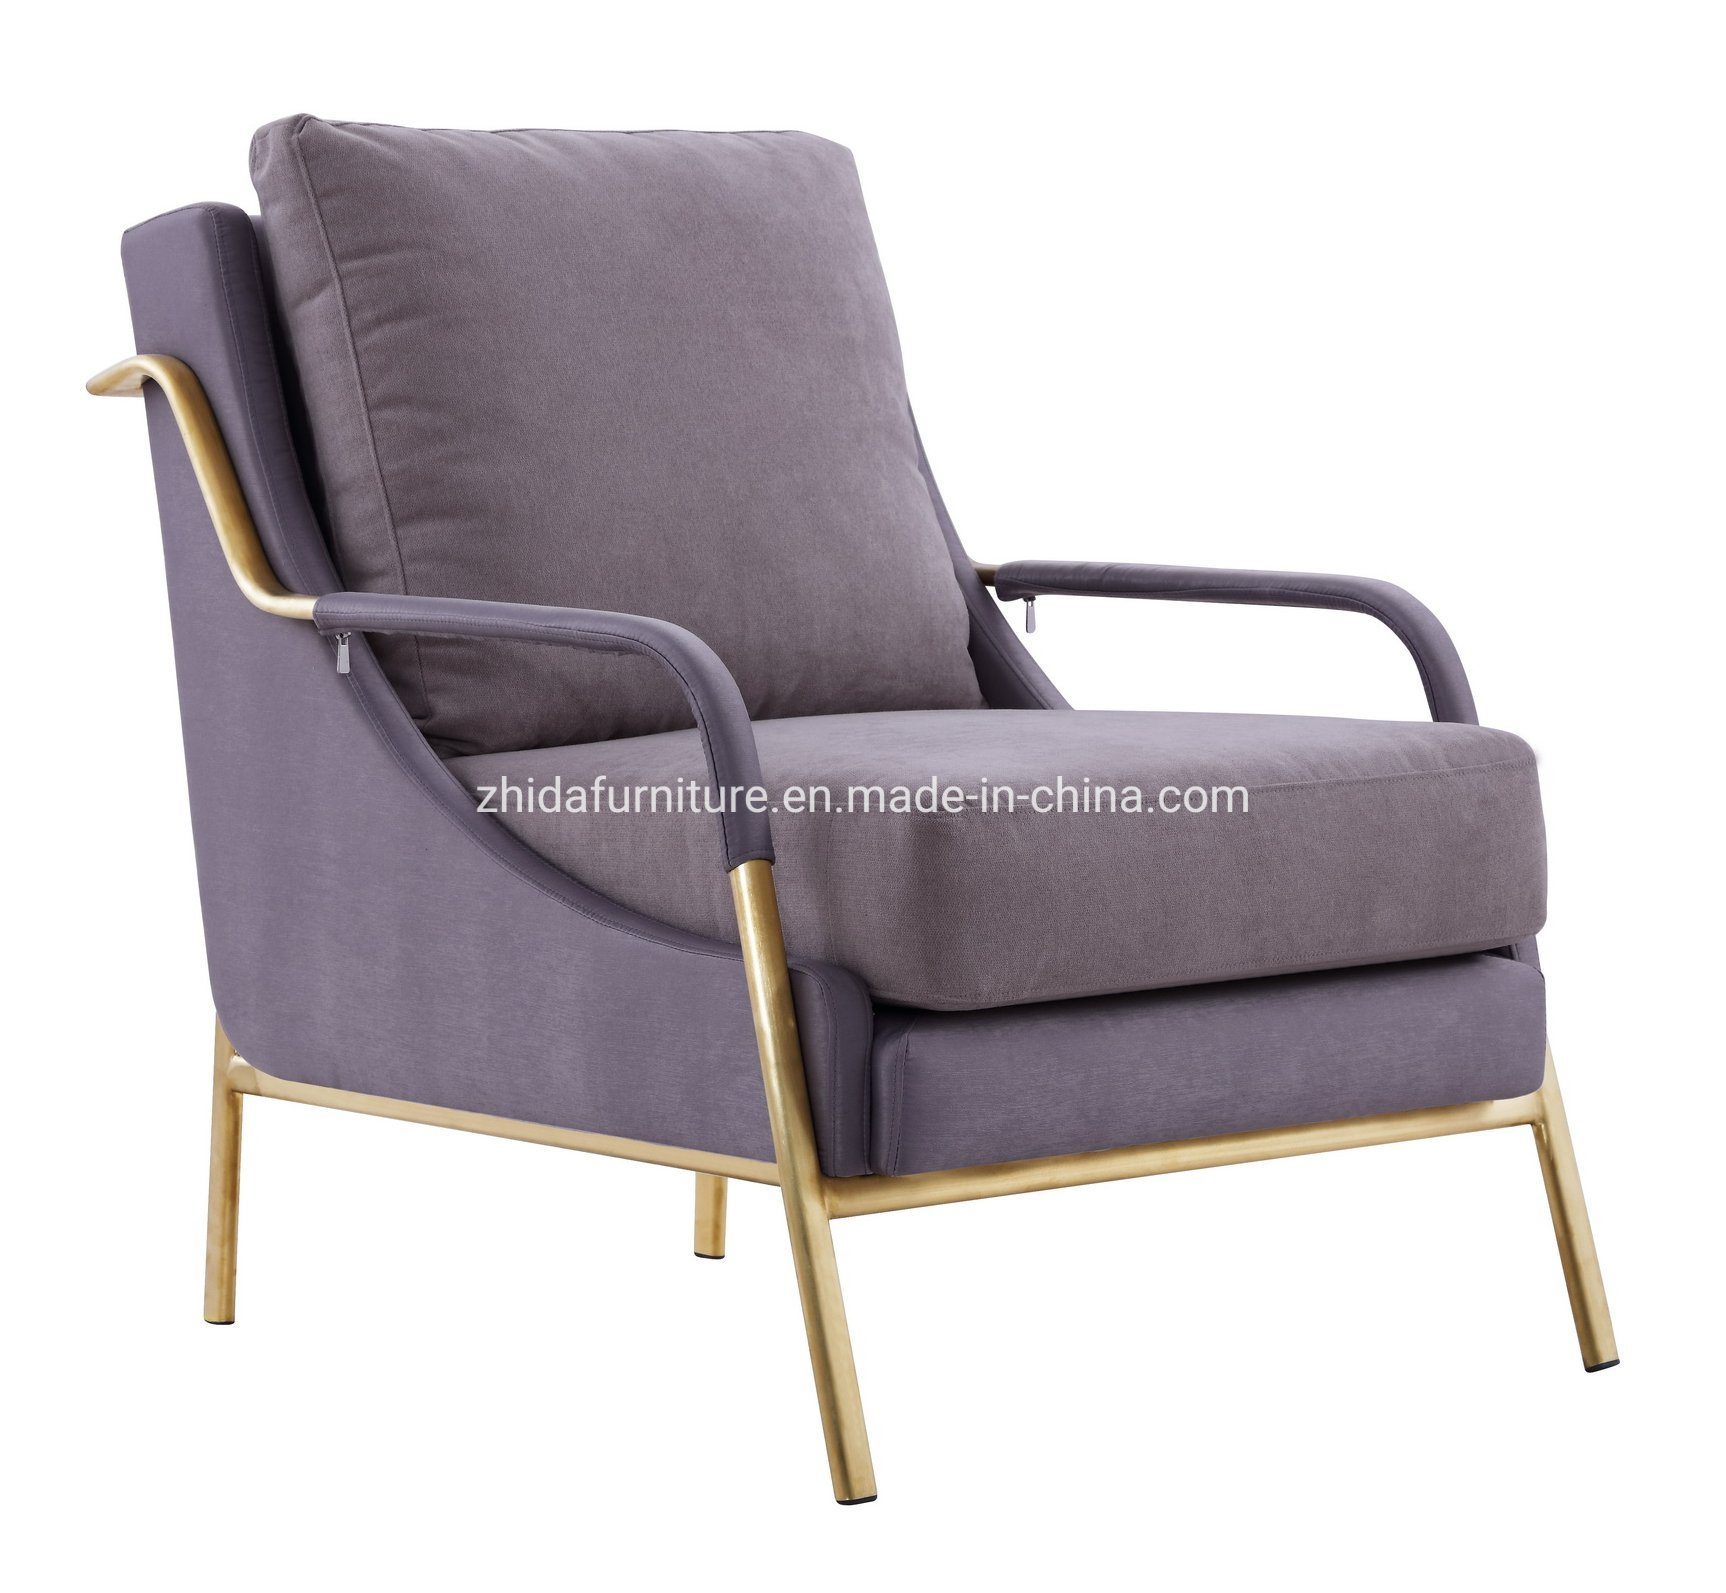 Phenomenal Hot Item Modern Furniture Gold Frame Hotel Lobby Bedroom Fabric Chair Machost Co Dining Chair Design Ideas Machostcouk